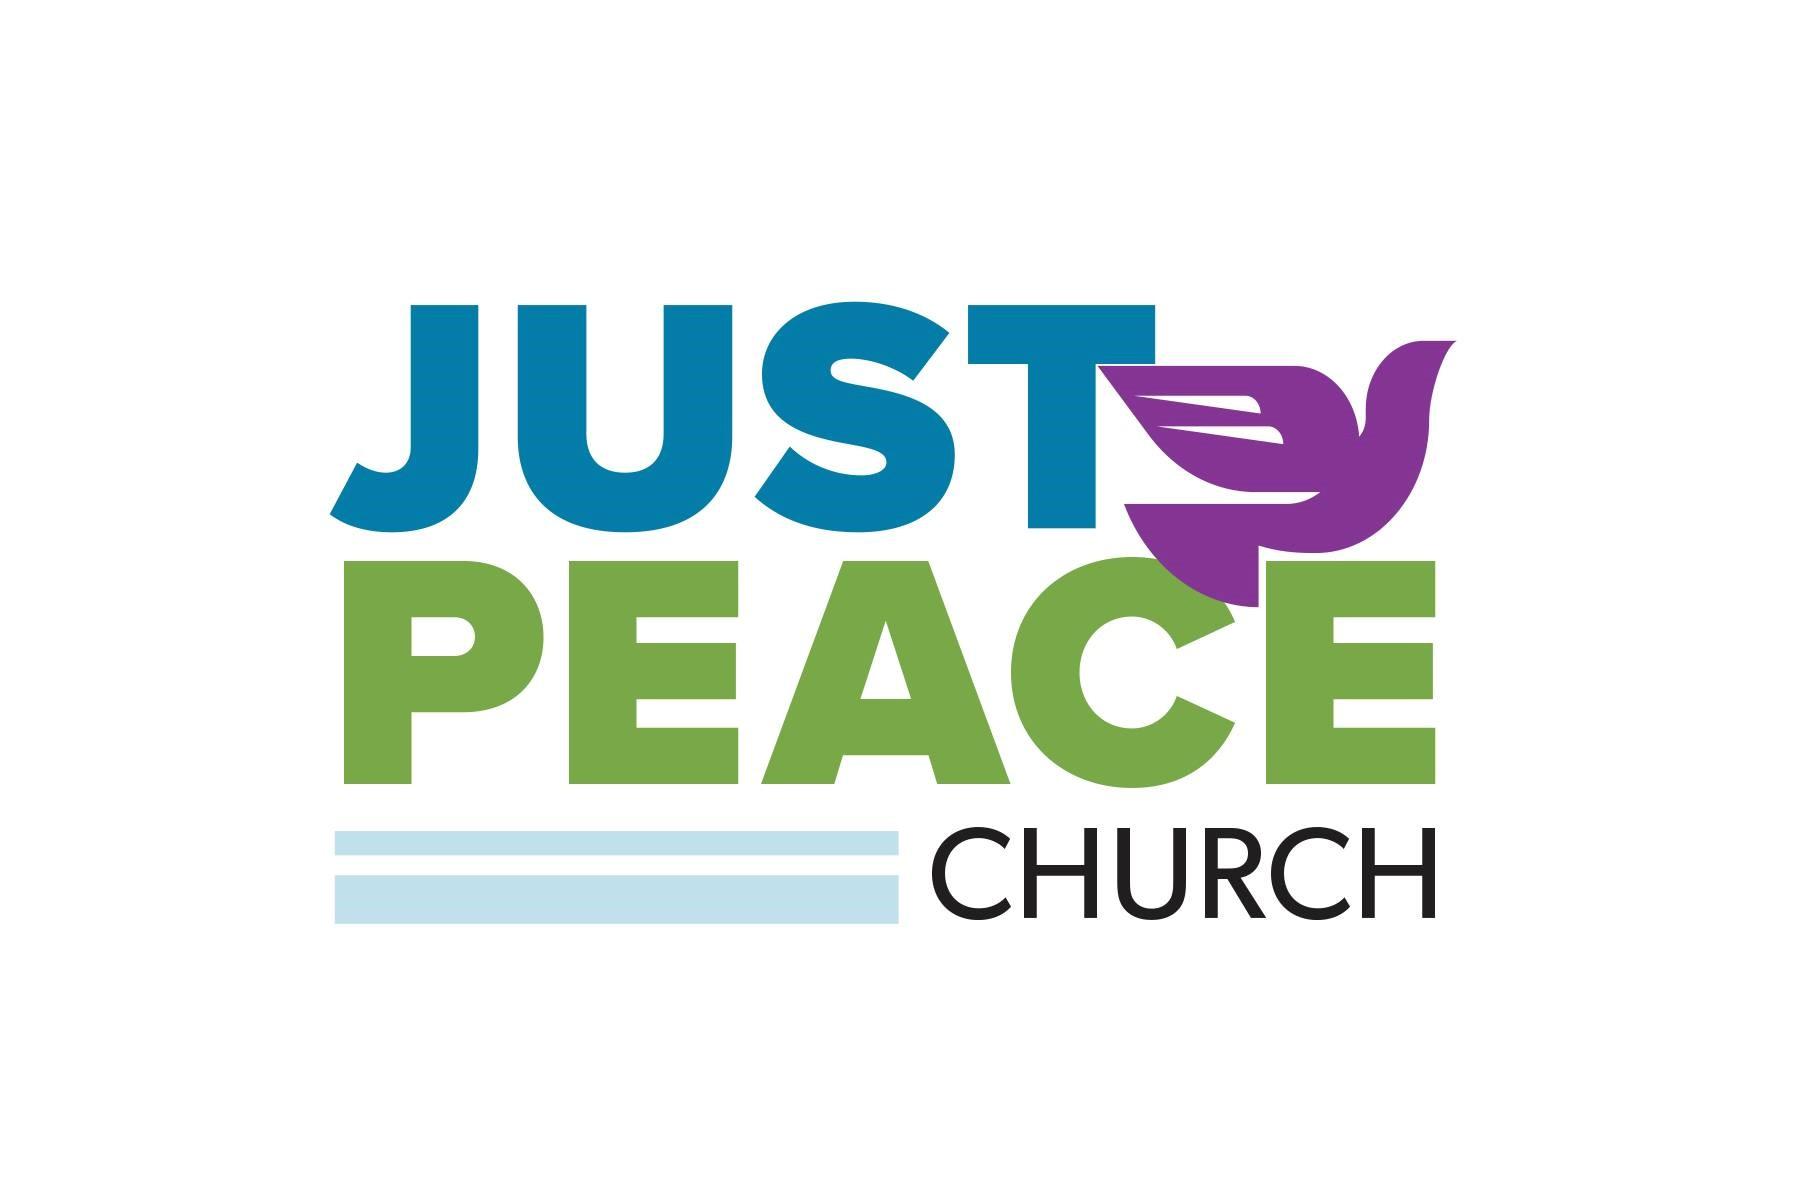 Just Peace Church logo